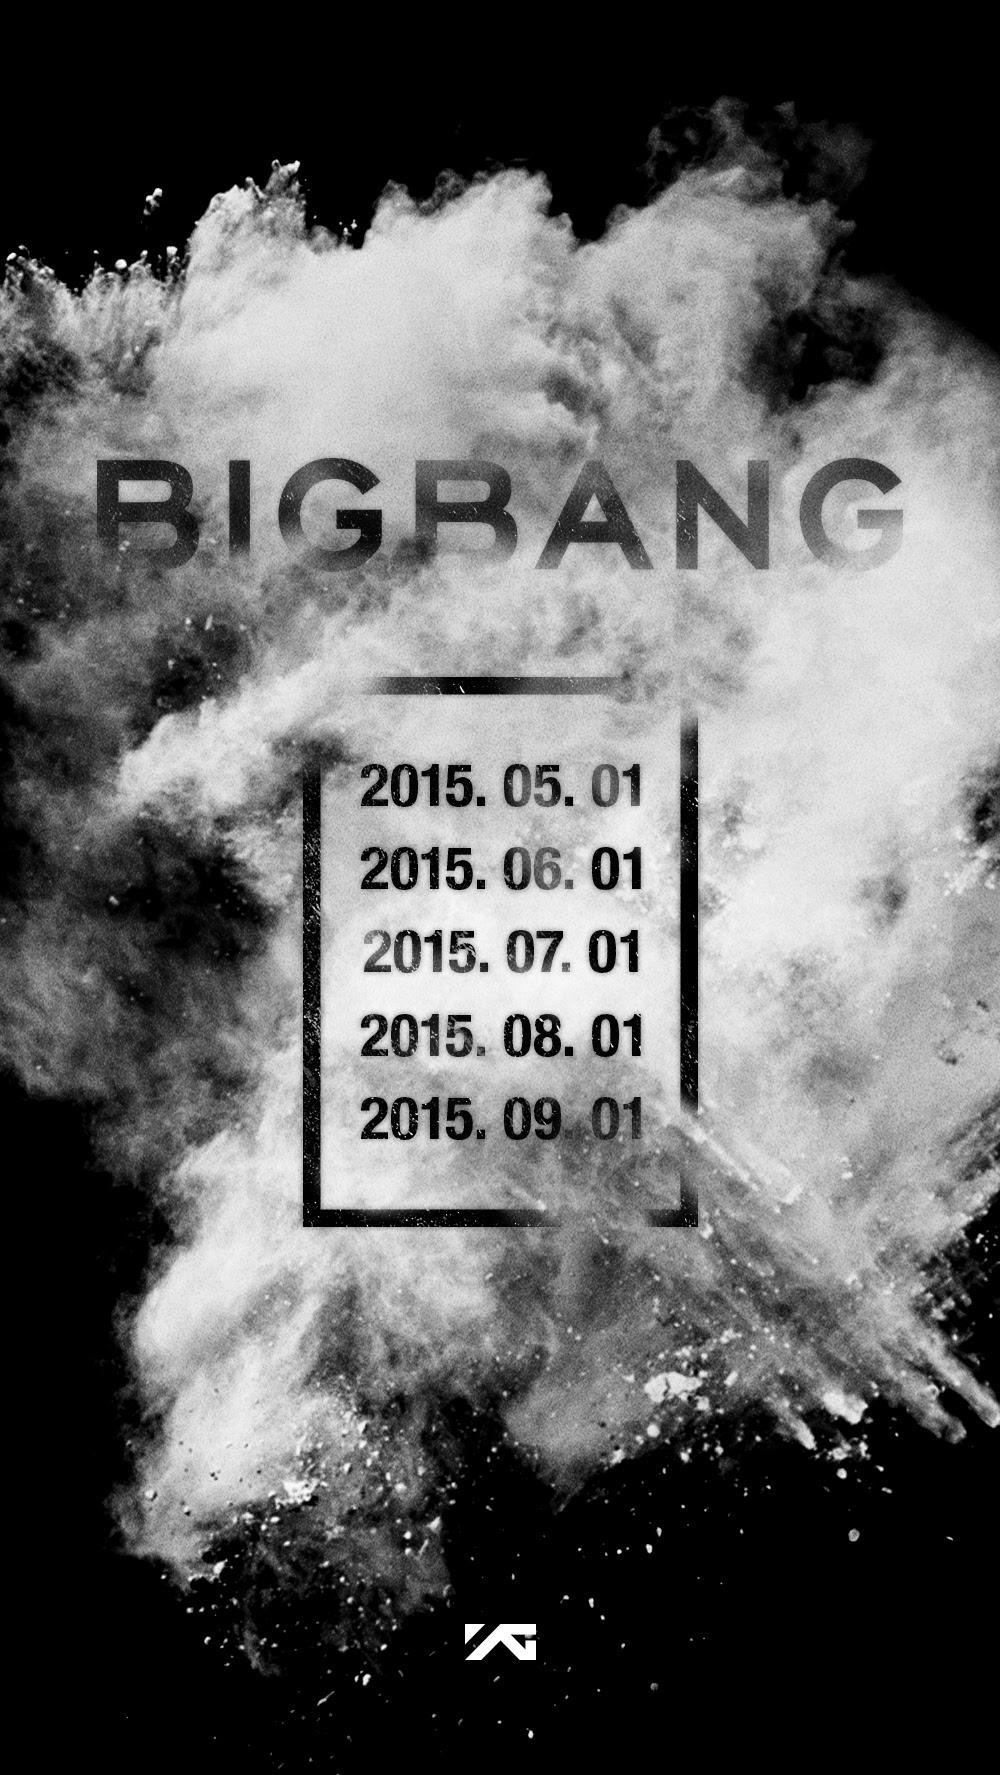 Big Bang - Comeback 2015 - 01apr2015.jpg